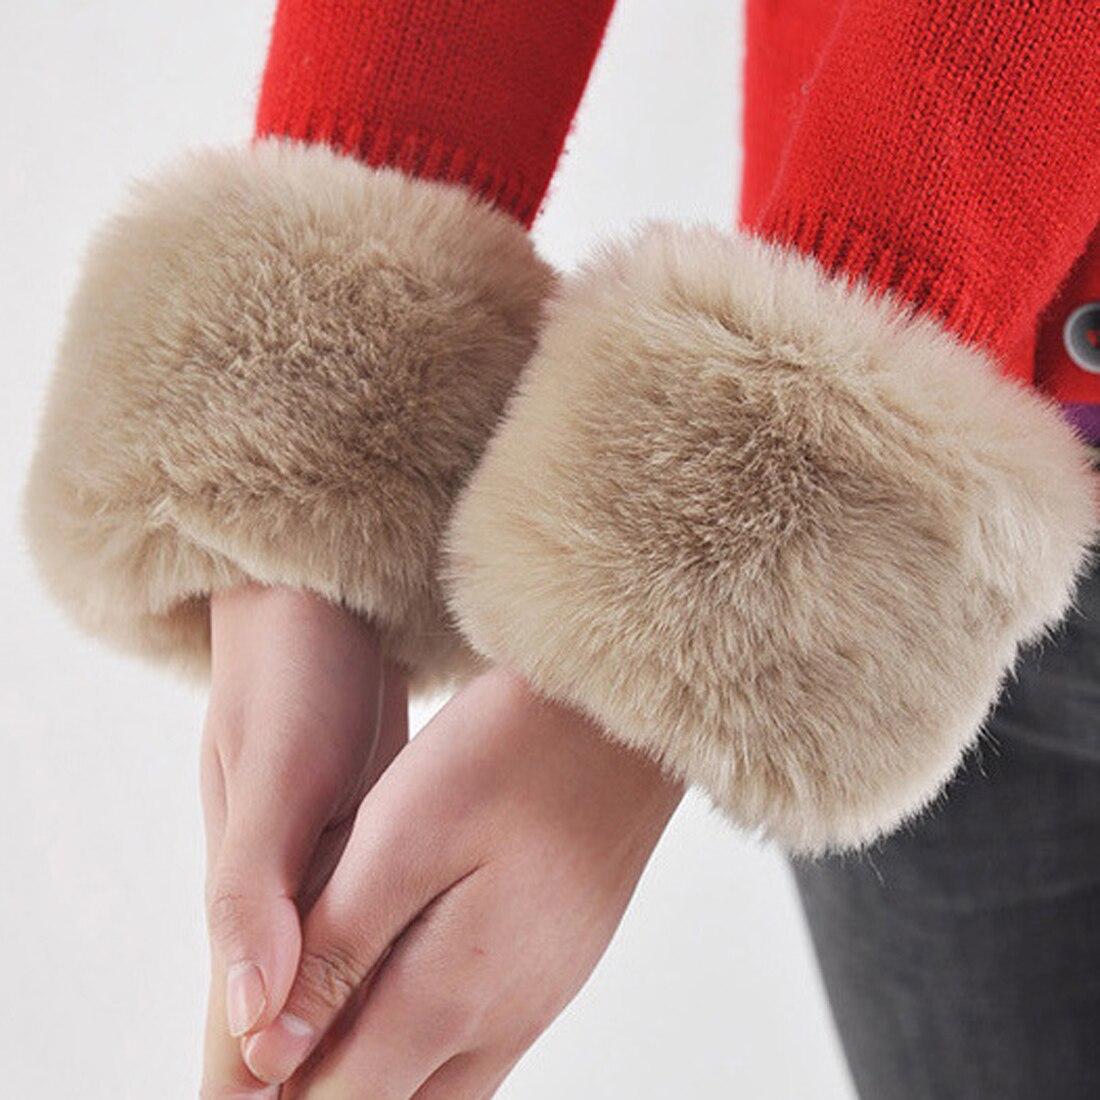 YJSFG HOUSE Fashion Winter Warm Women's Faux Fur Wrist Warmer Slap On Cuffs Arm Warmer Gray Black Pink